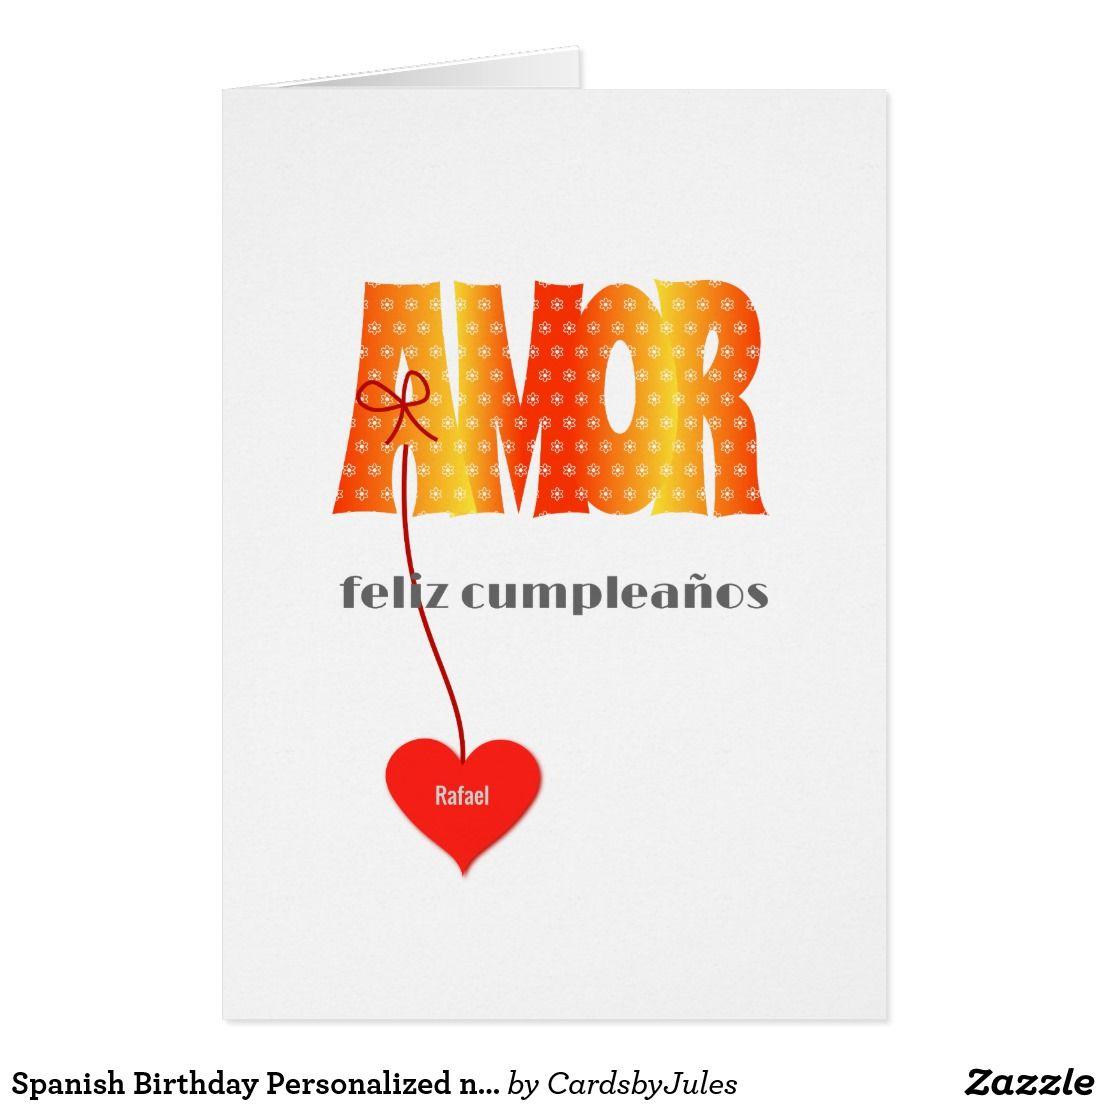 Spanish Birthday Personalized Name AMOR Card